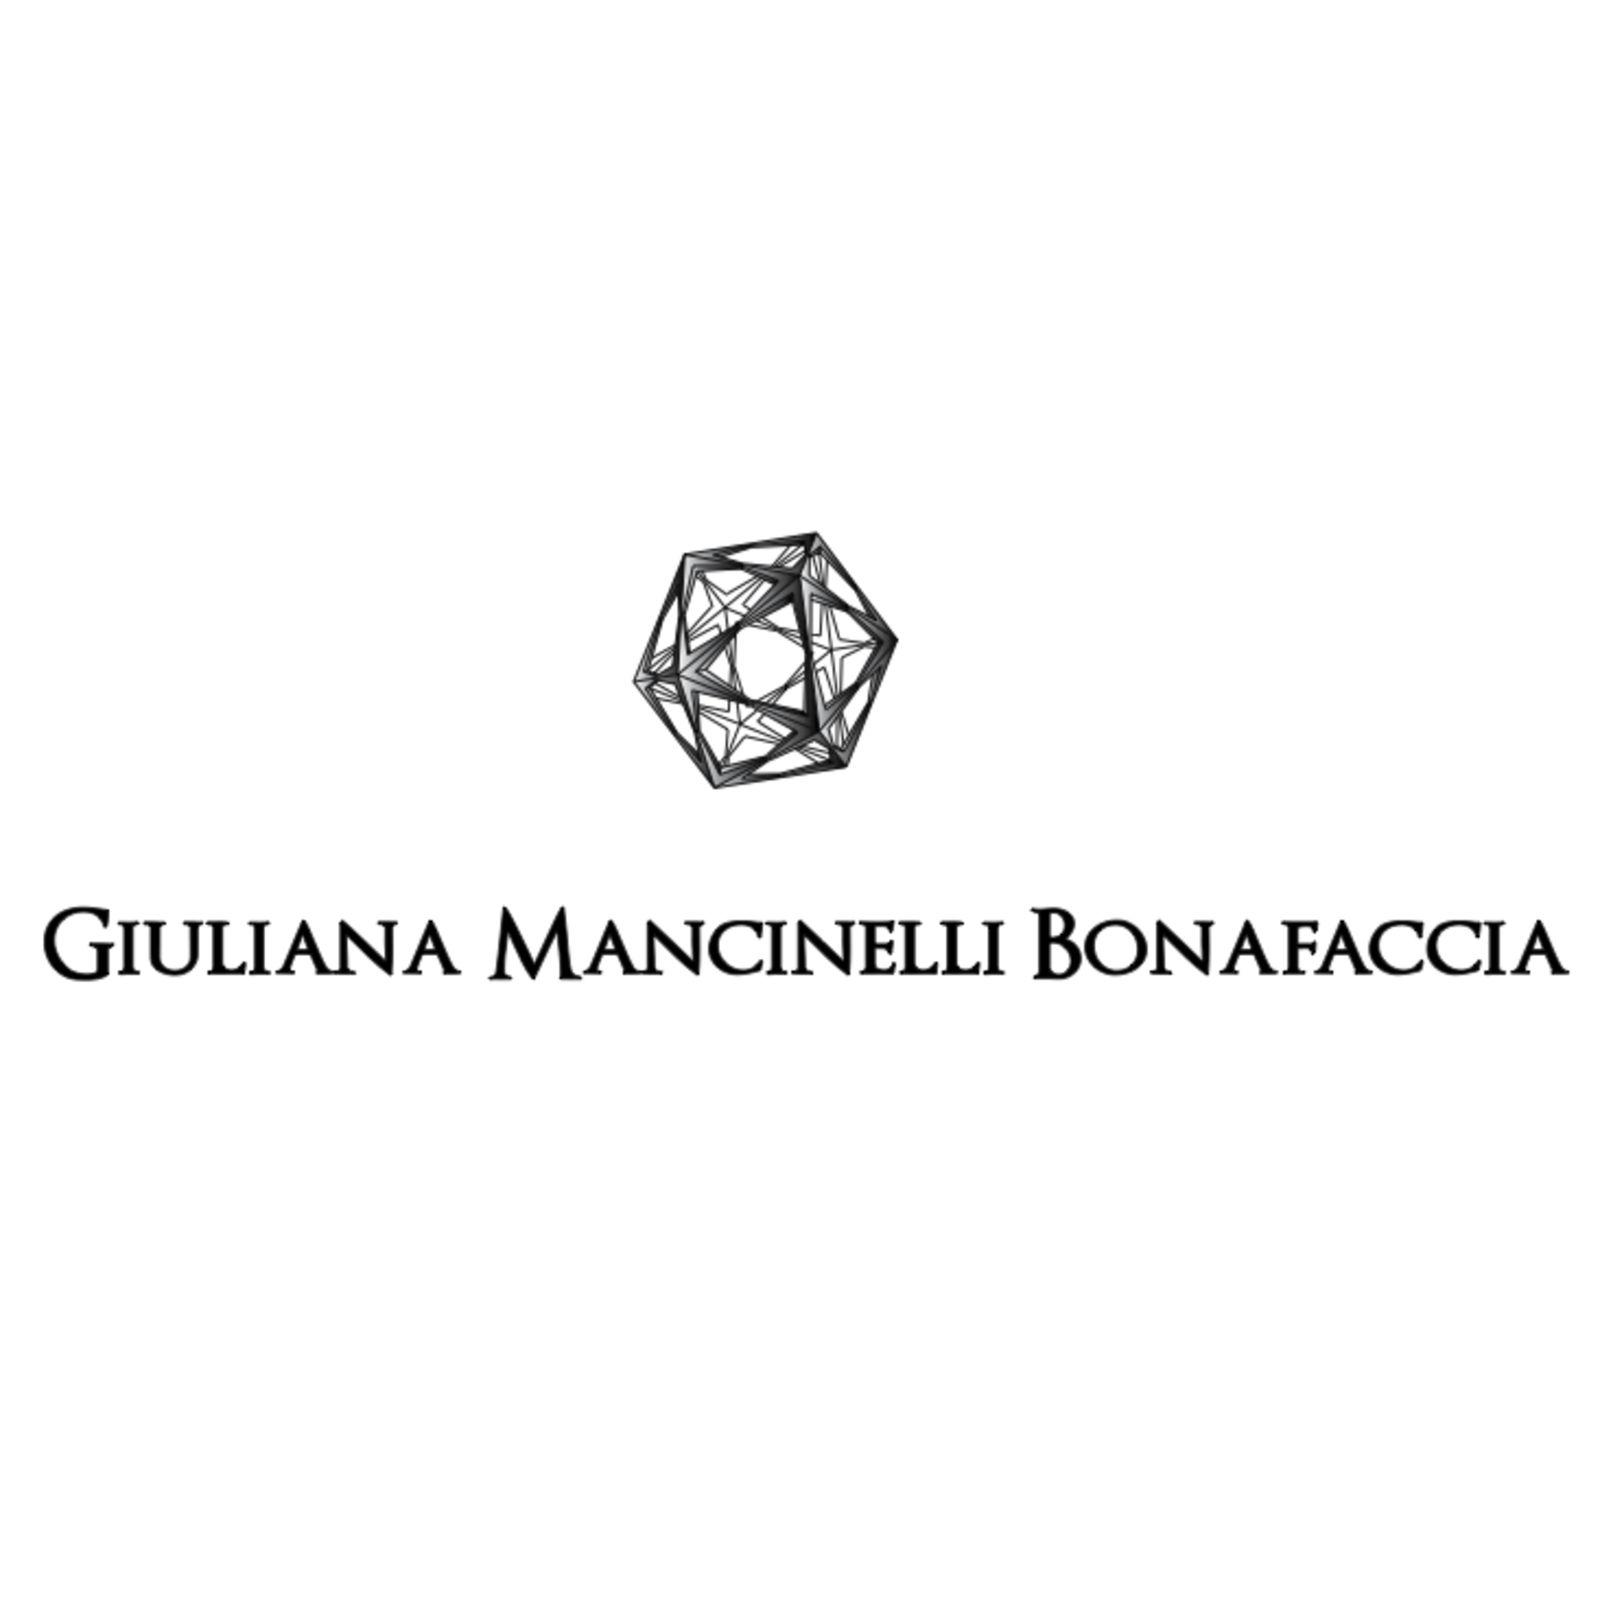 GIULIANA MANCINELLI BONAFACCIA